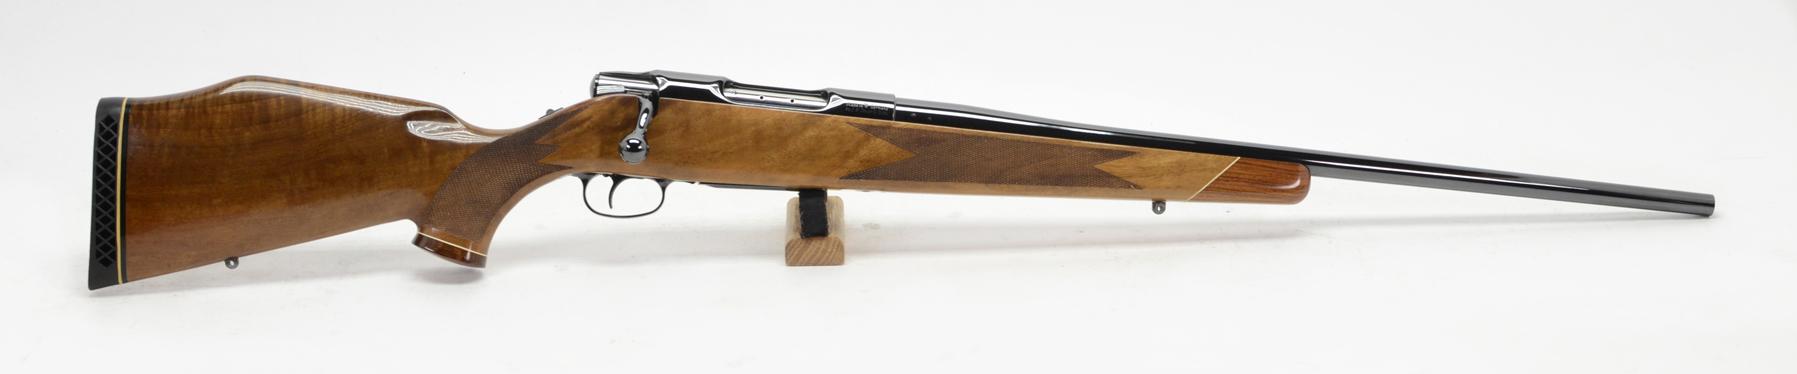 Colt Sauer 22-250